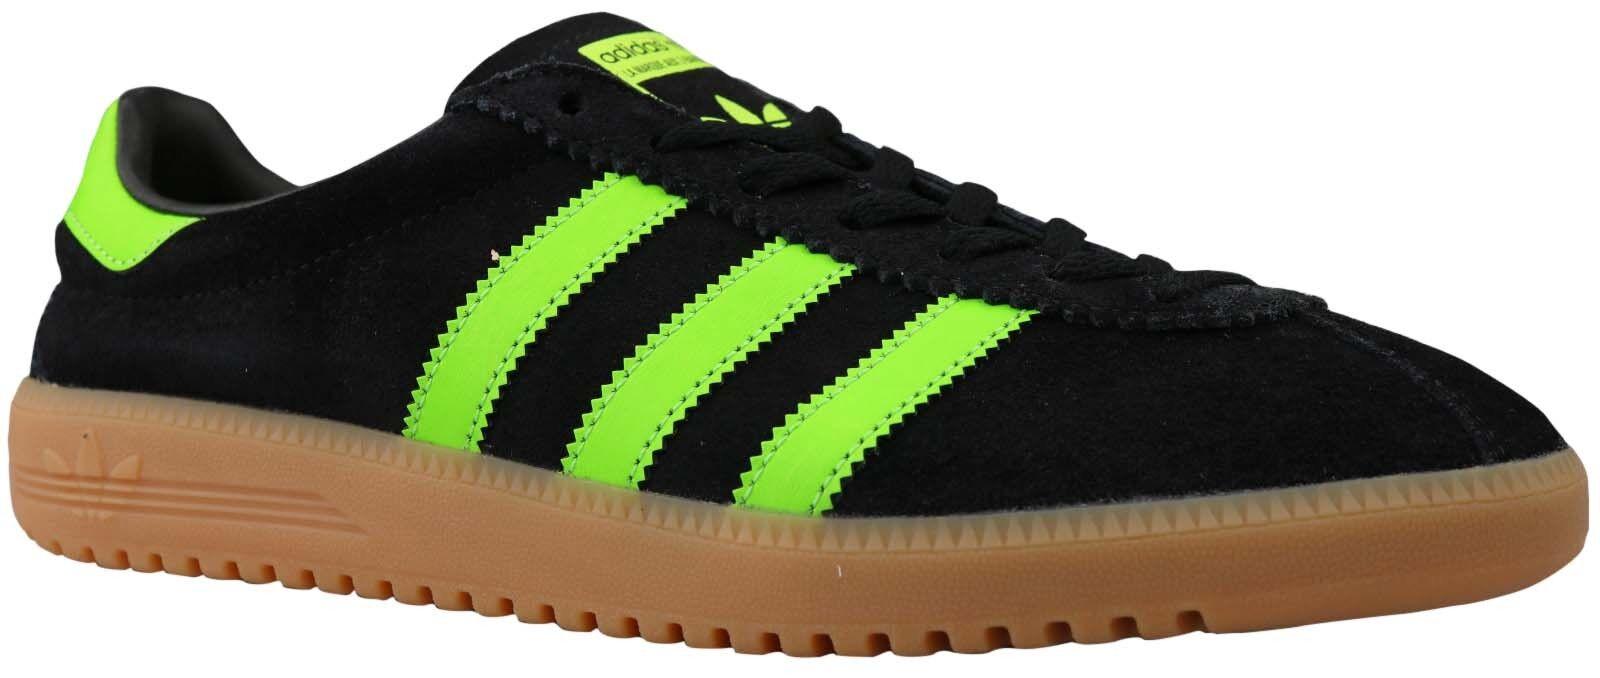 ADIDAS Originals Bermuda Sneaker Schuhe schwarz BB5271 Gr. 40 - 44,5 NEU & OVP